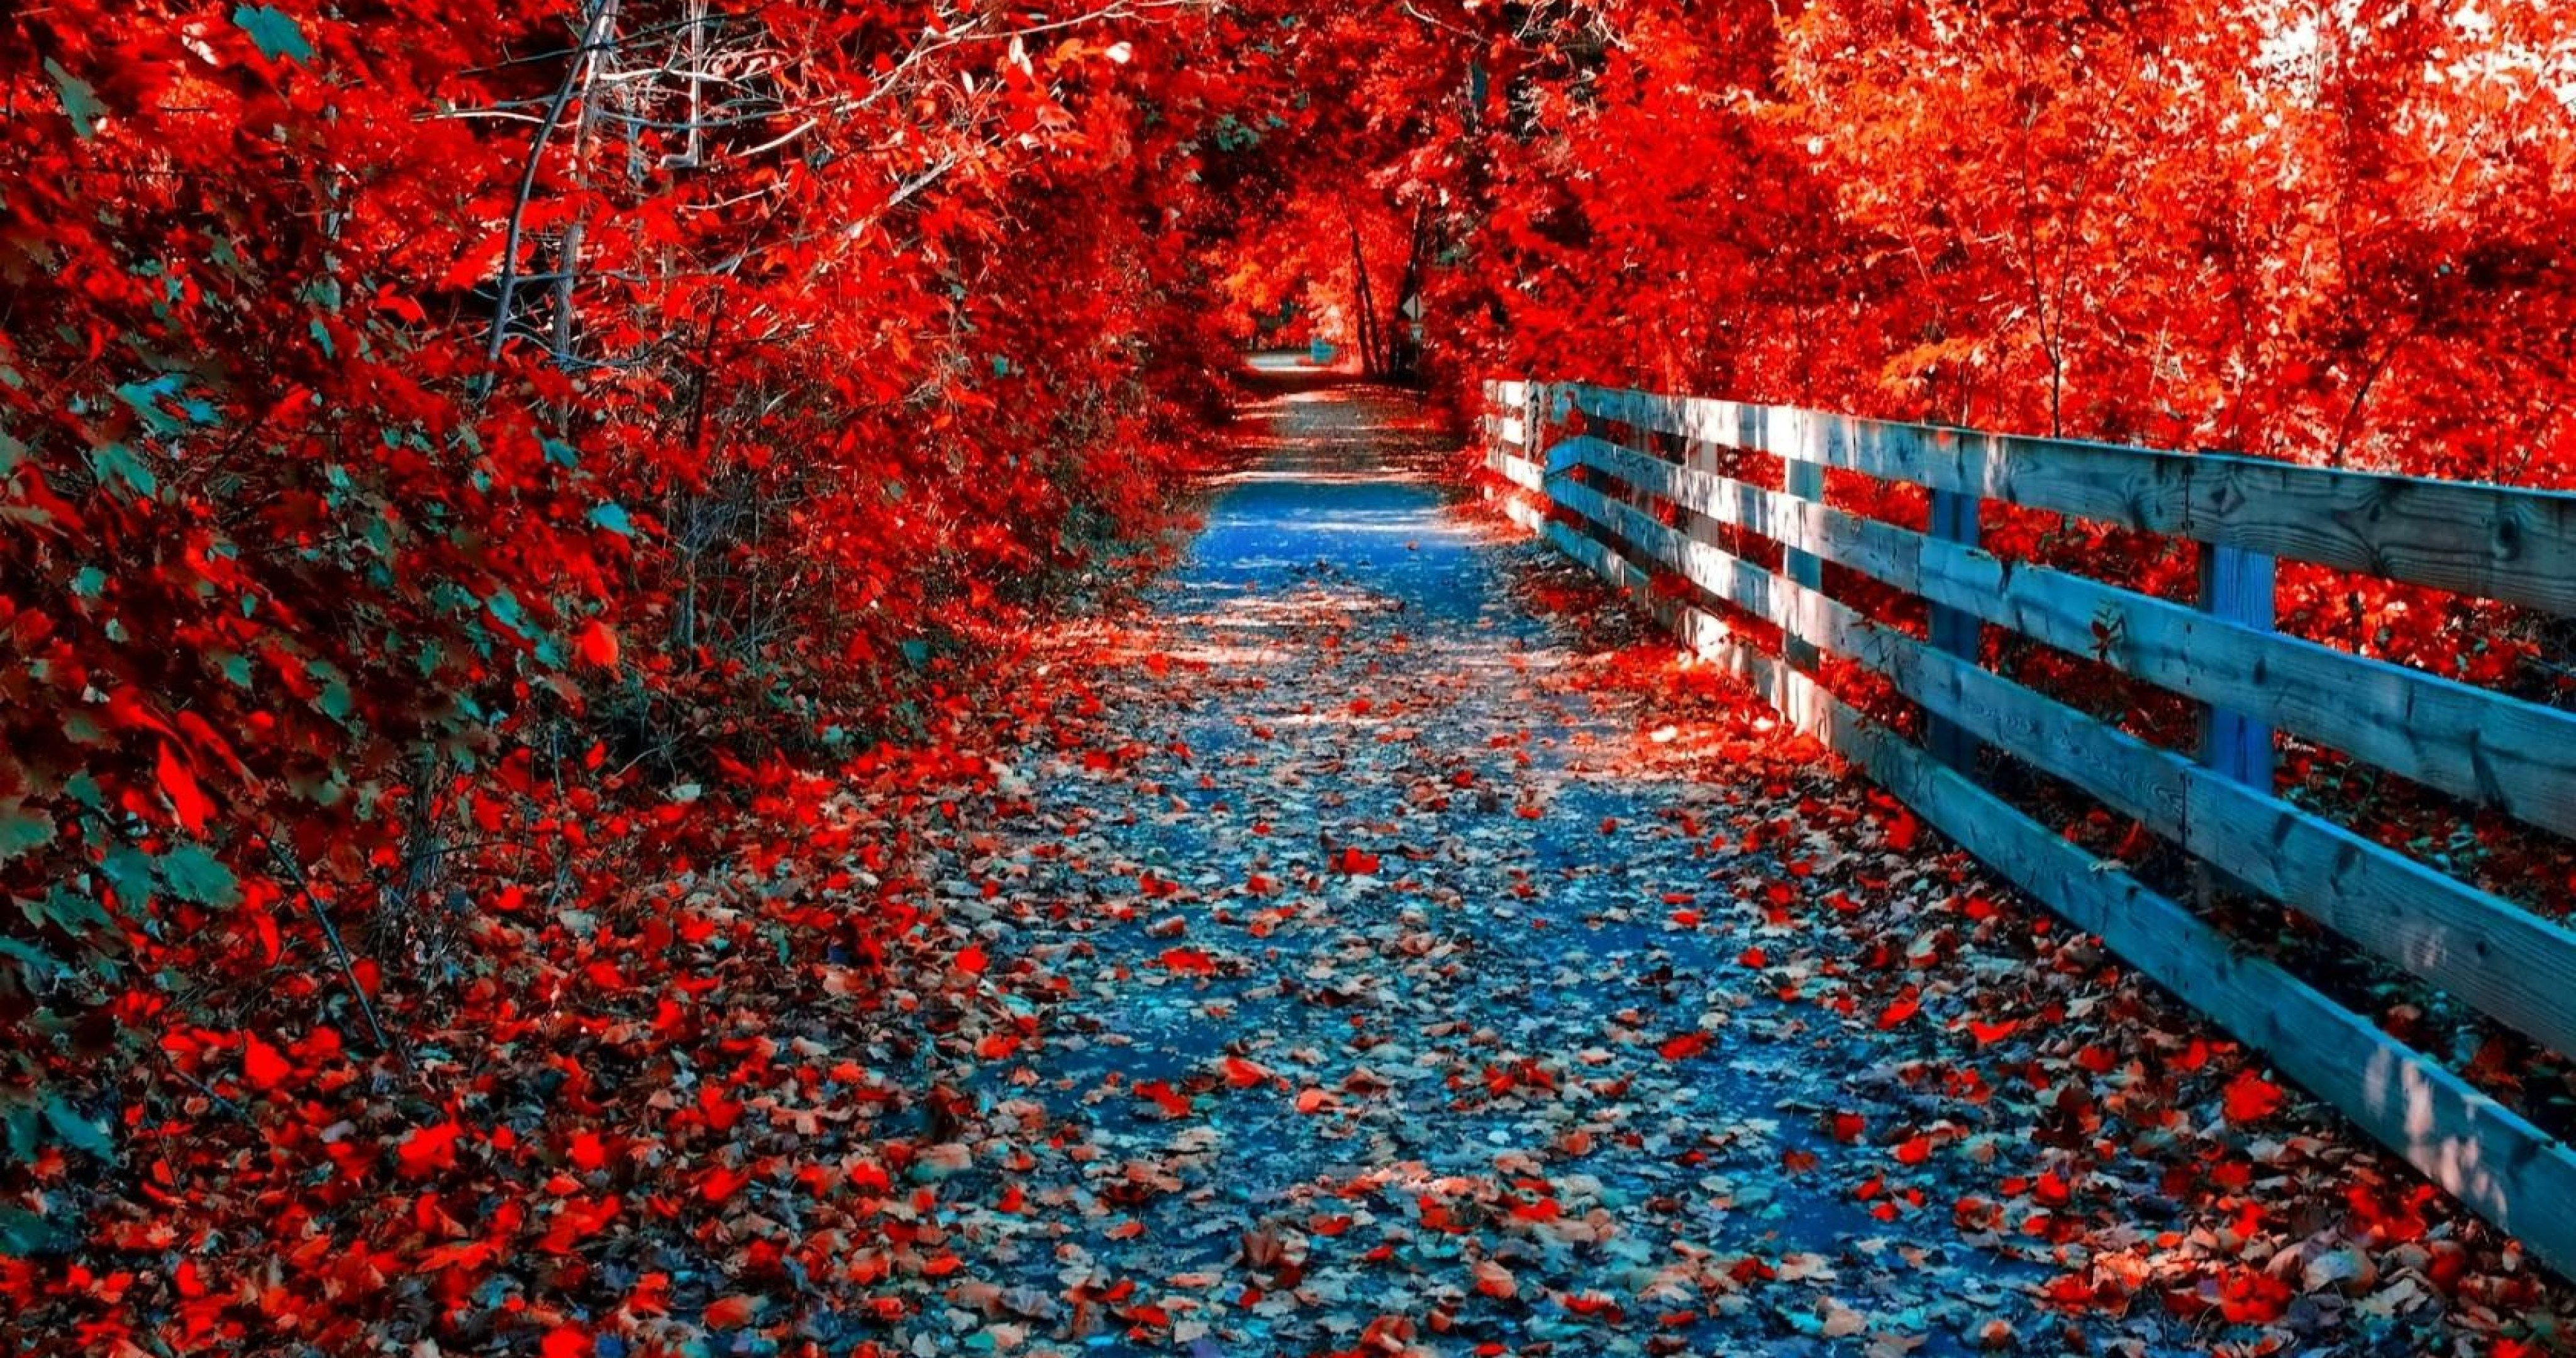 4k Ultra Hd Autumn Wallpapers Top Free 4k Ultra Hd Autumn Backgrounds Wallpaperaccess